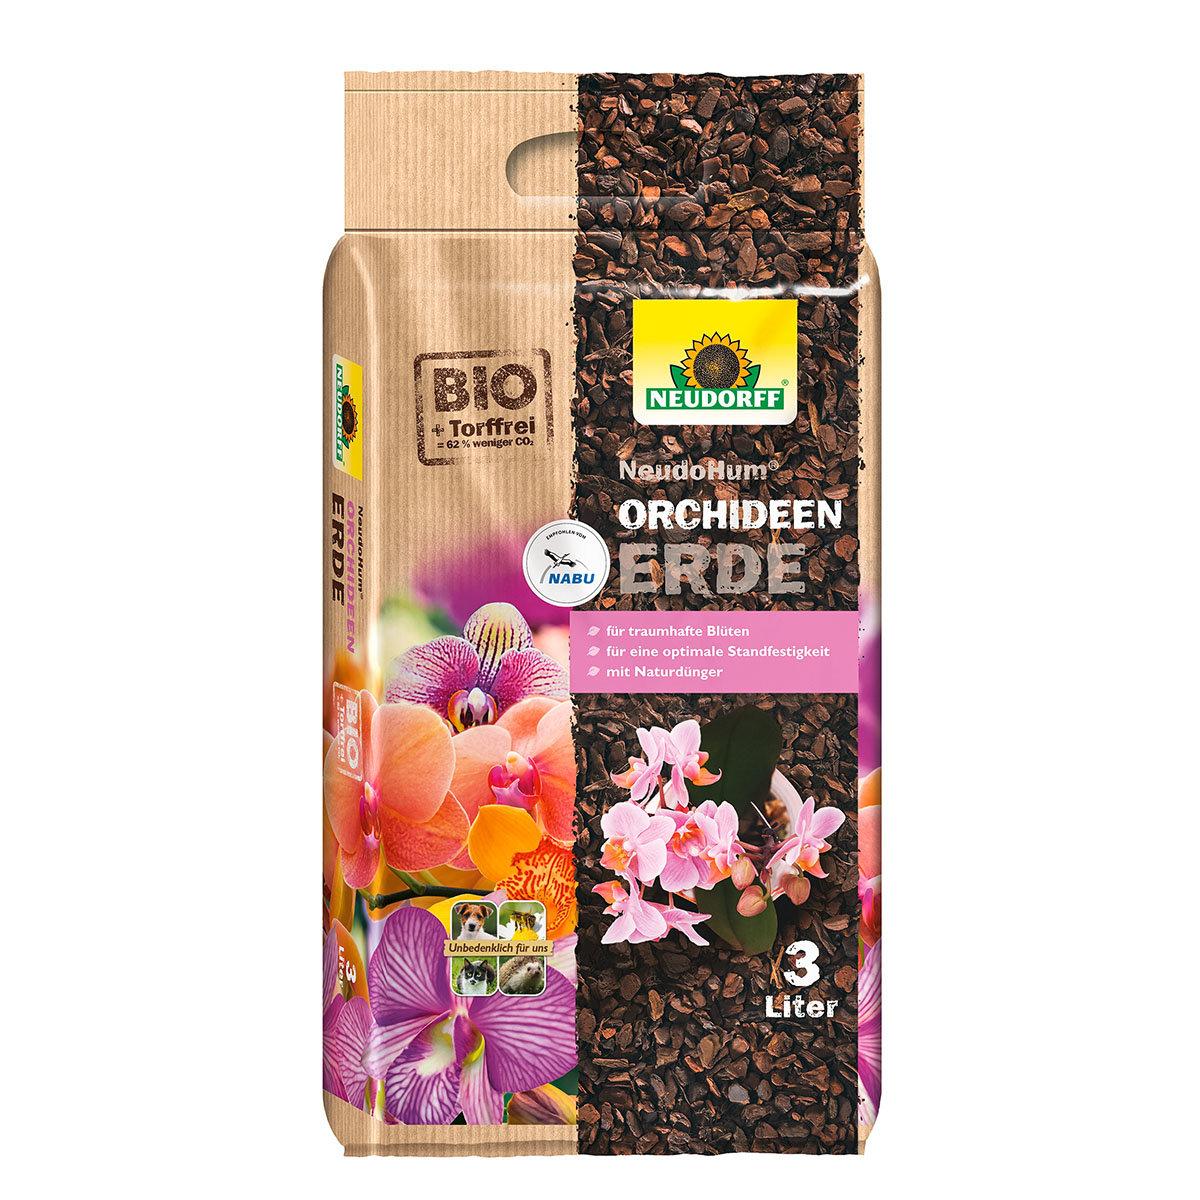 Neudorff NeudoHum® Orchideen Erde, 3-Liter